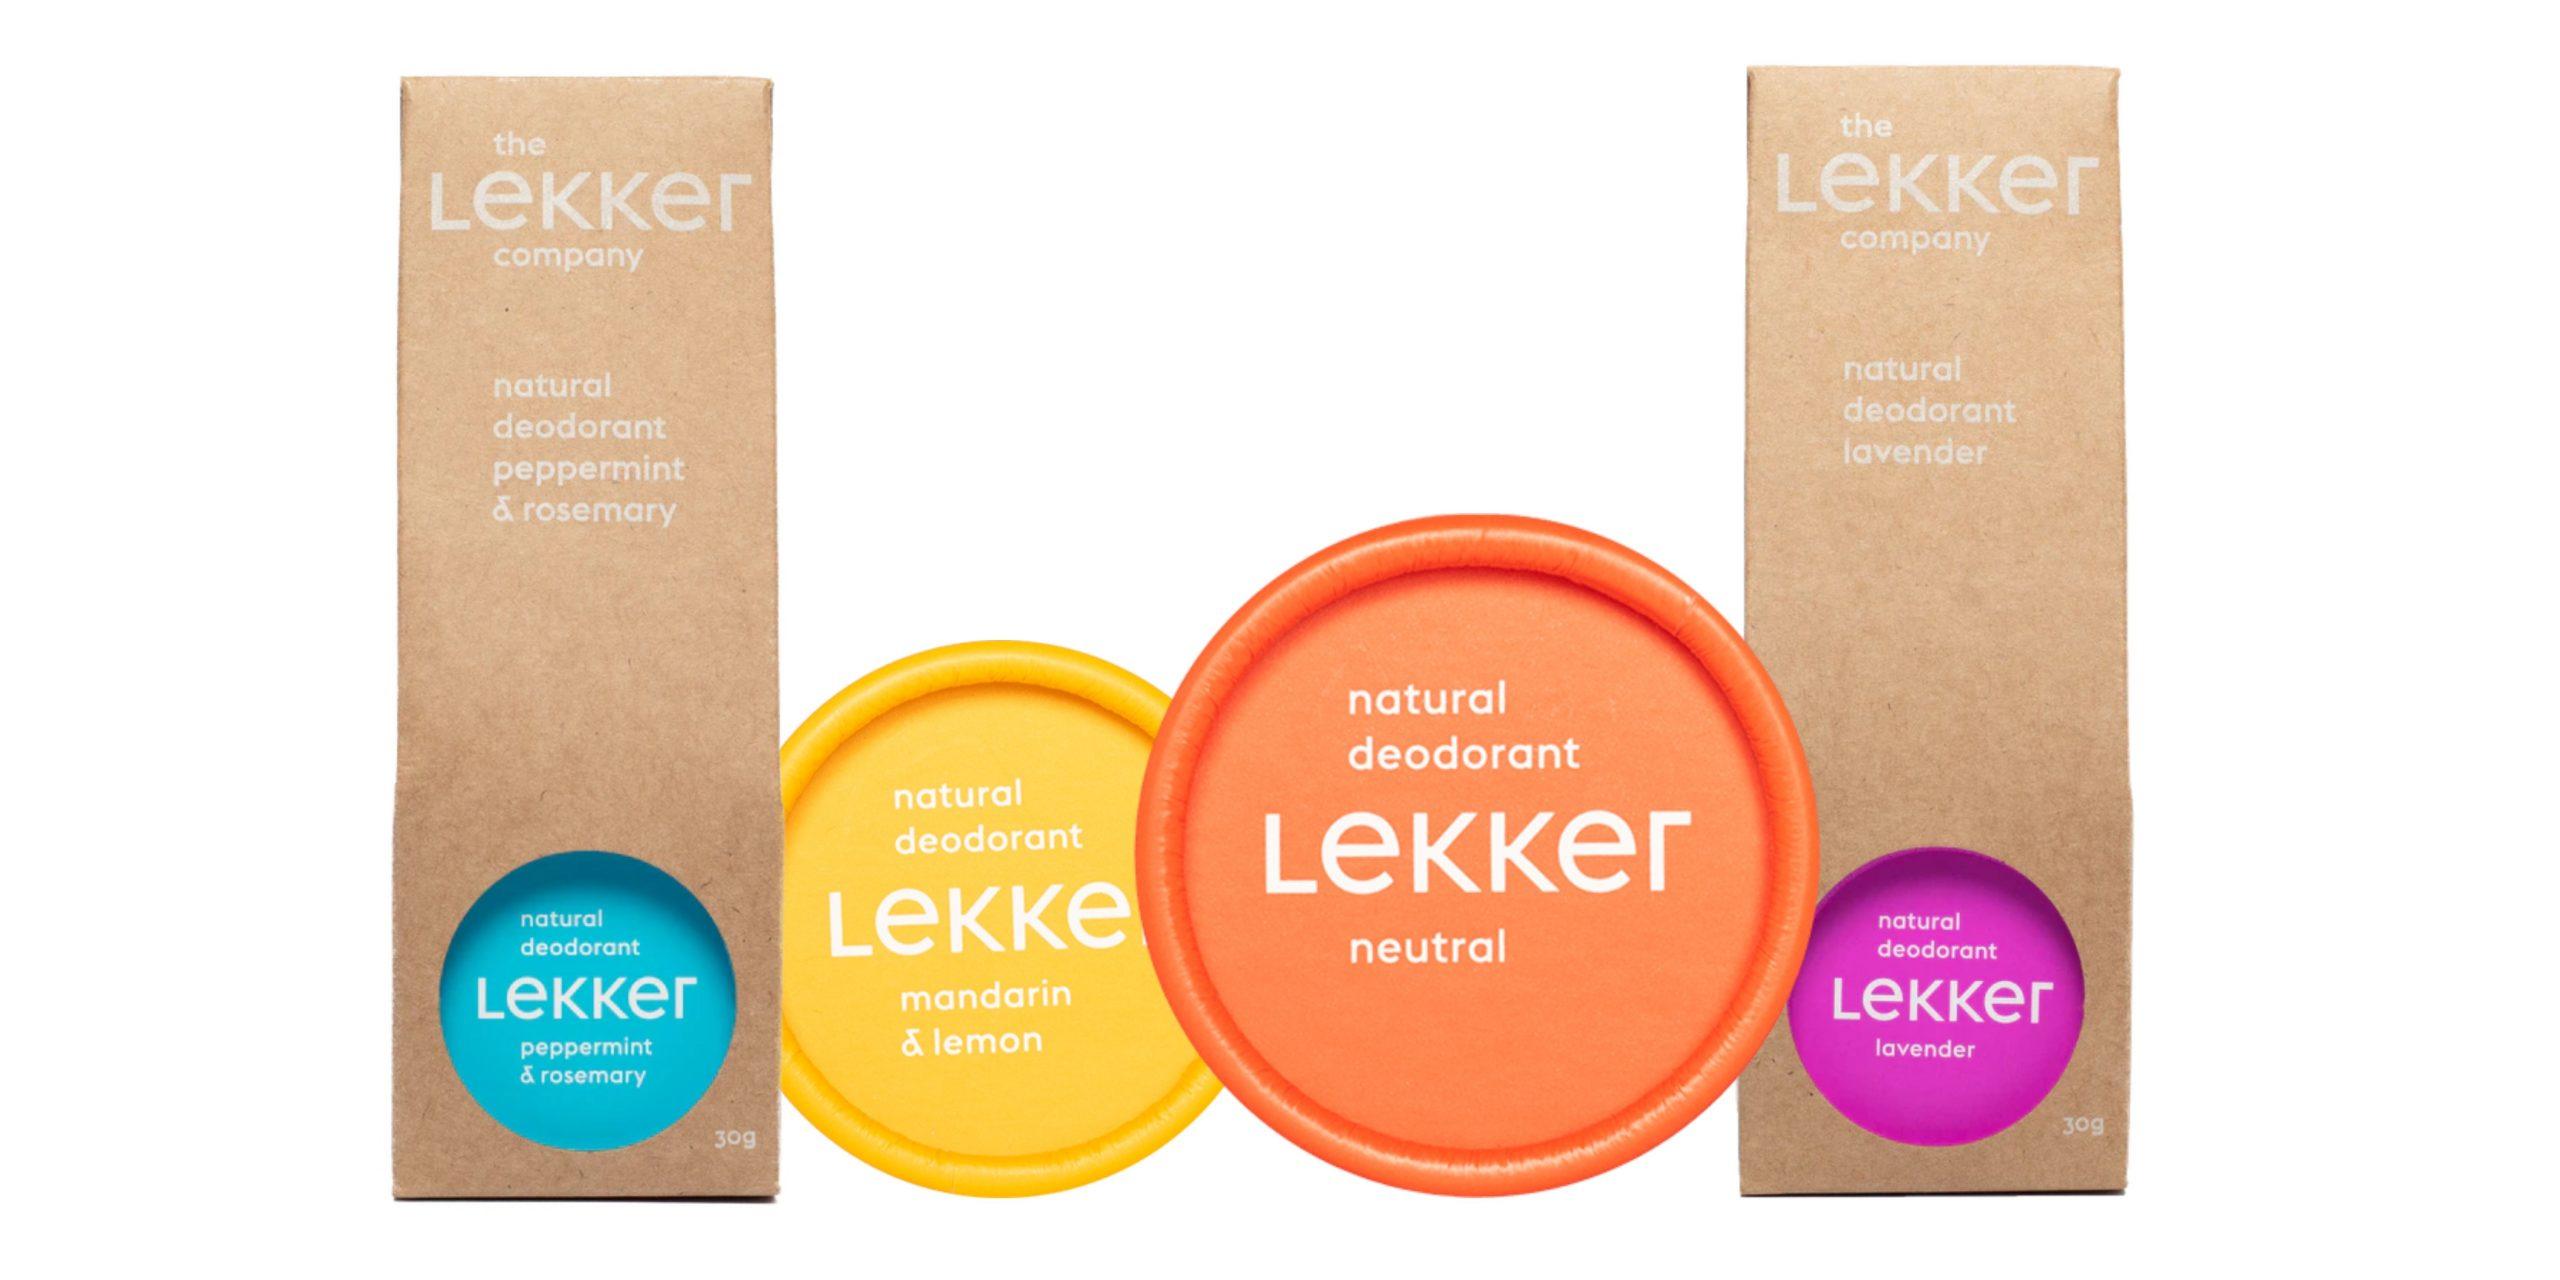 The lekker company